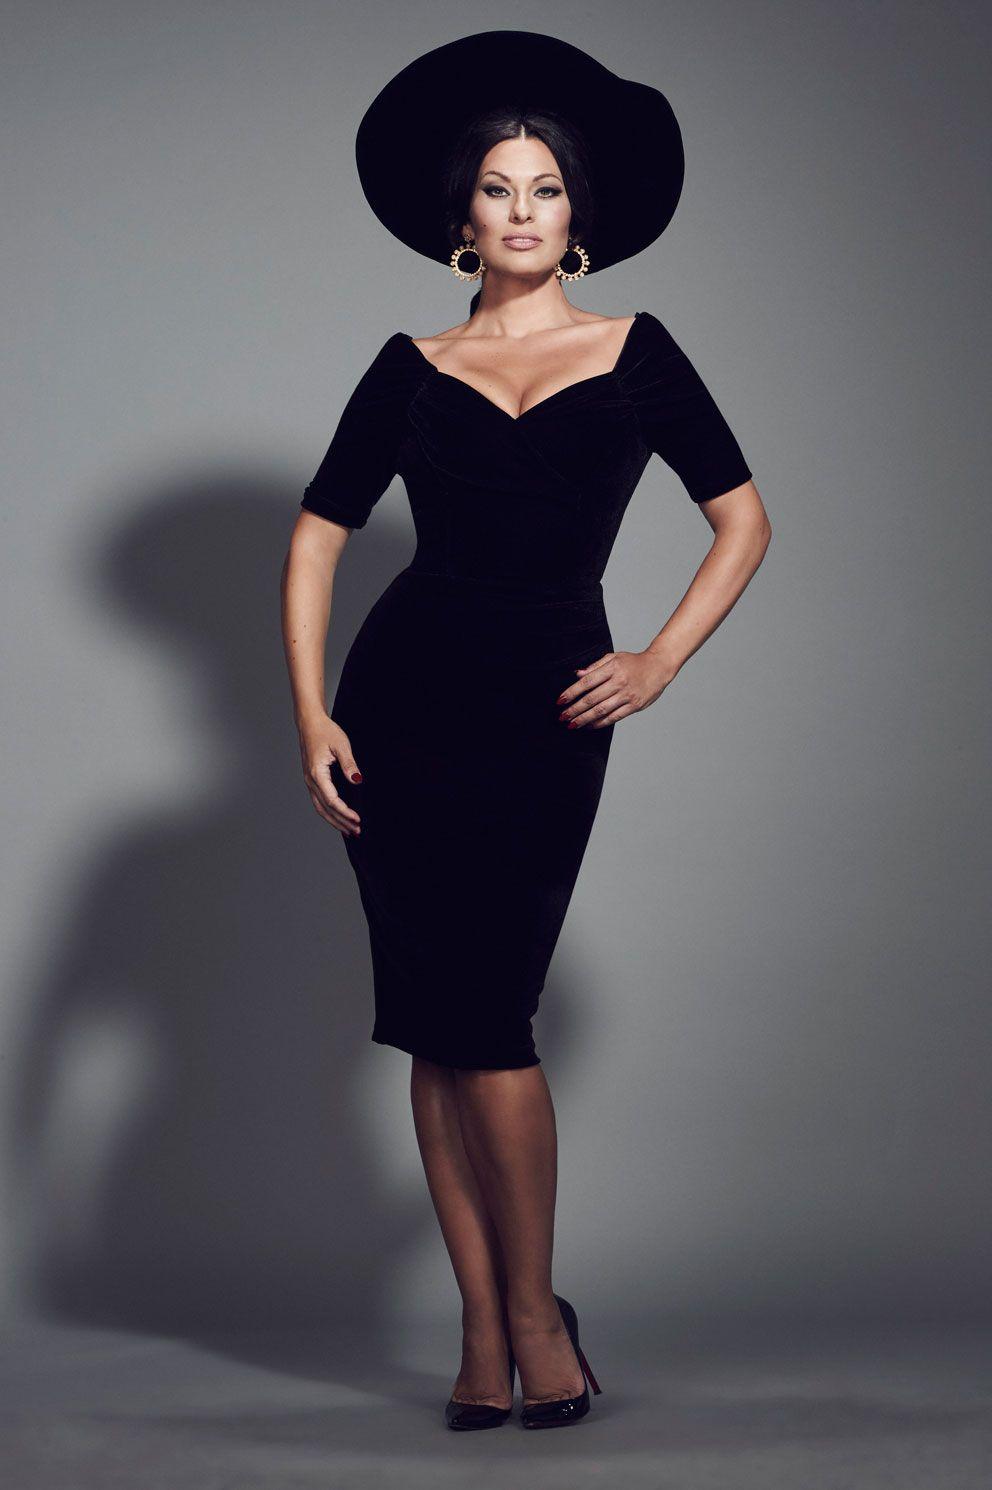 Monte Carlo Black Velvet Pencil Dress | The Pretty Dress Company ...